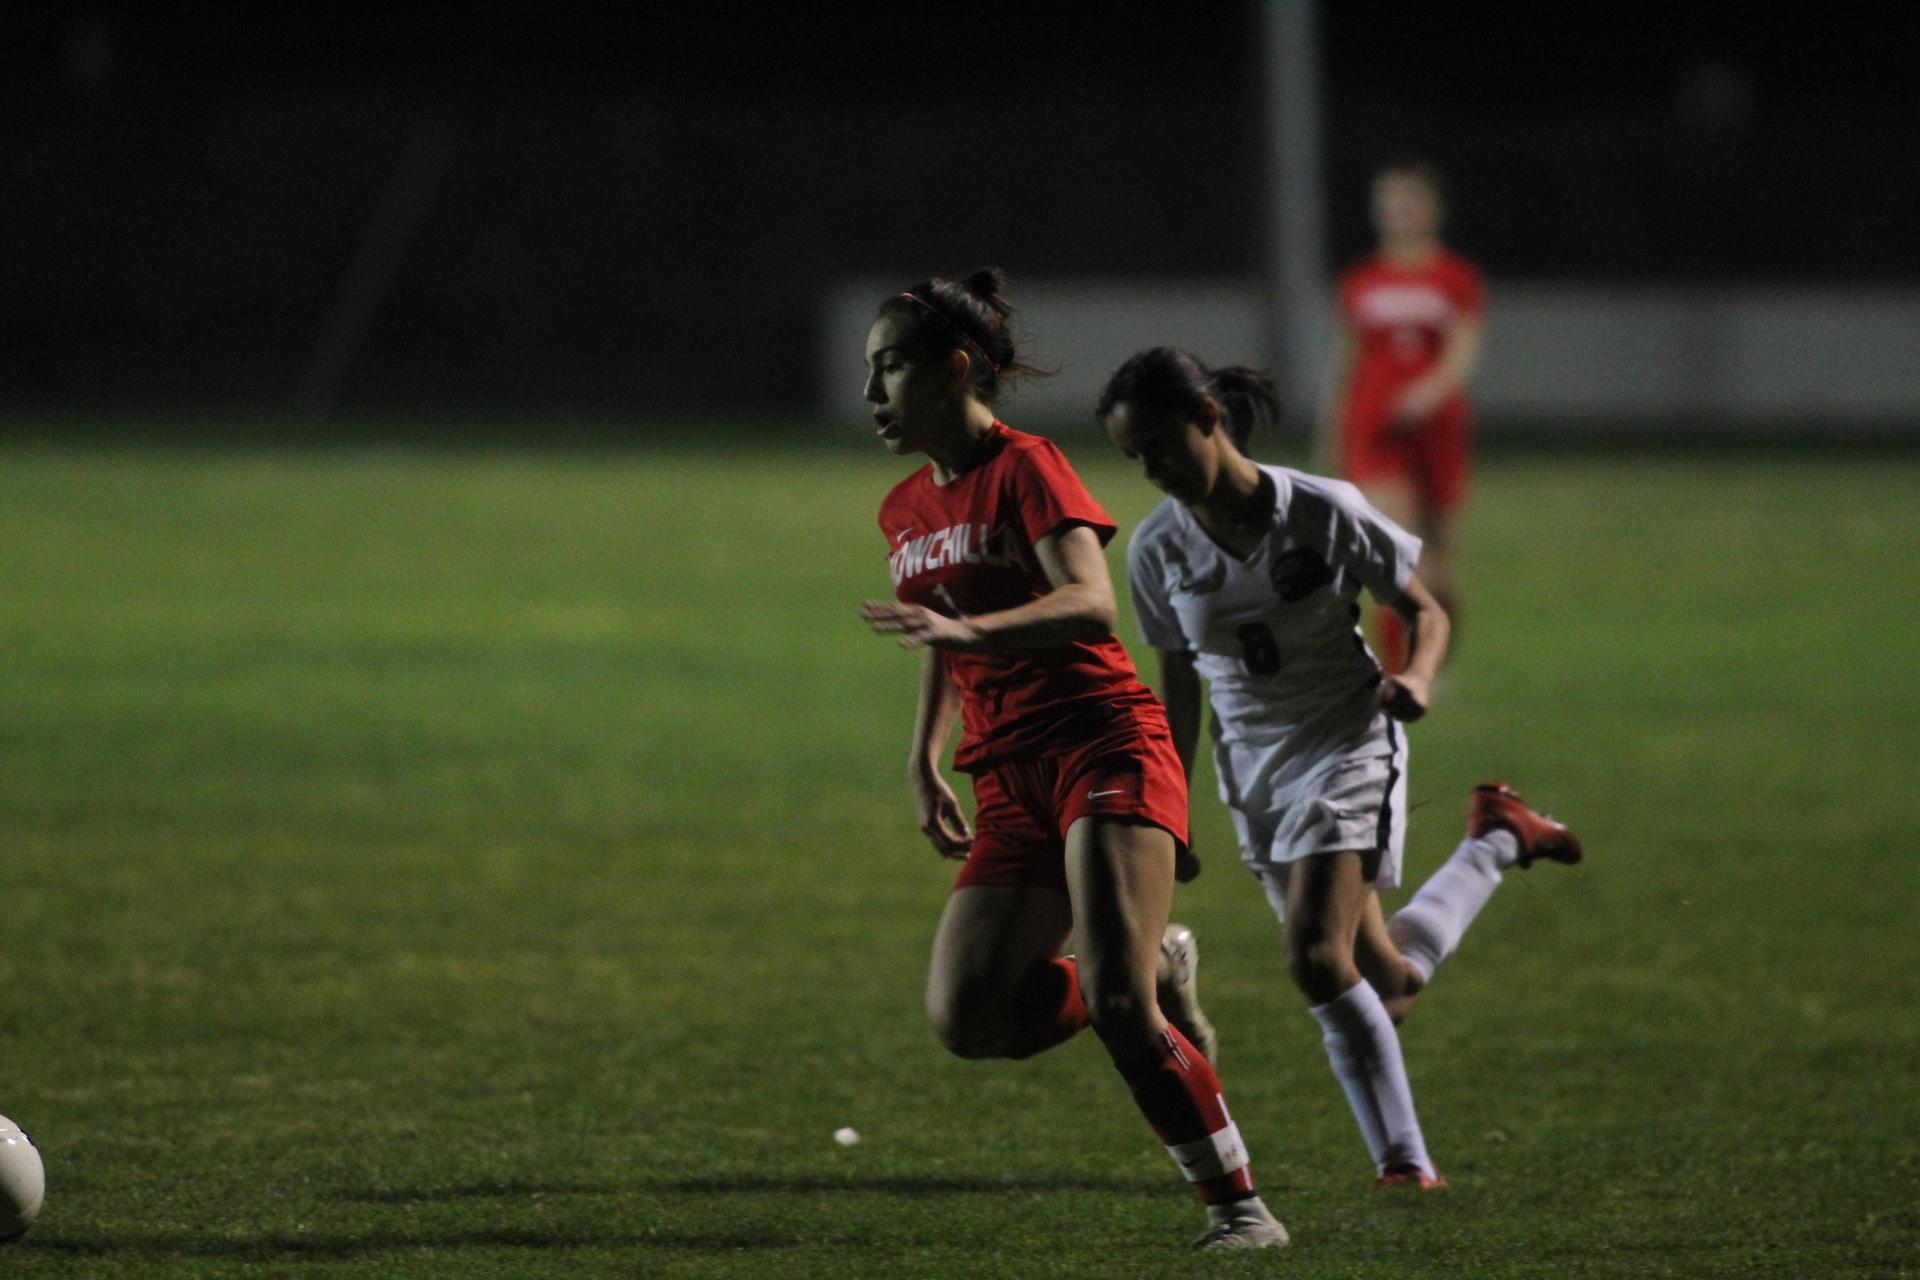 Girls Playing Soccer vs Kerman